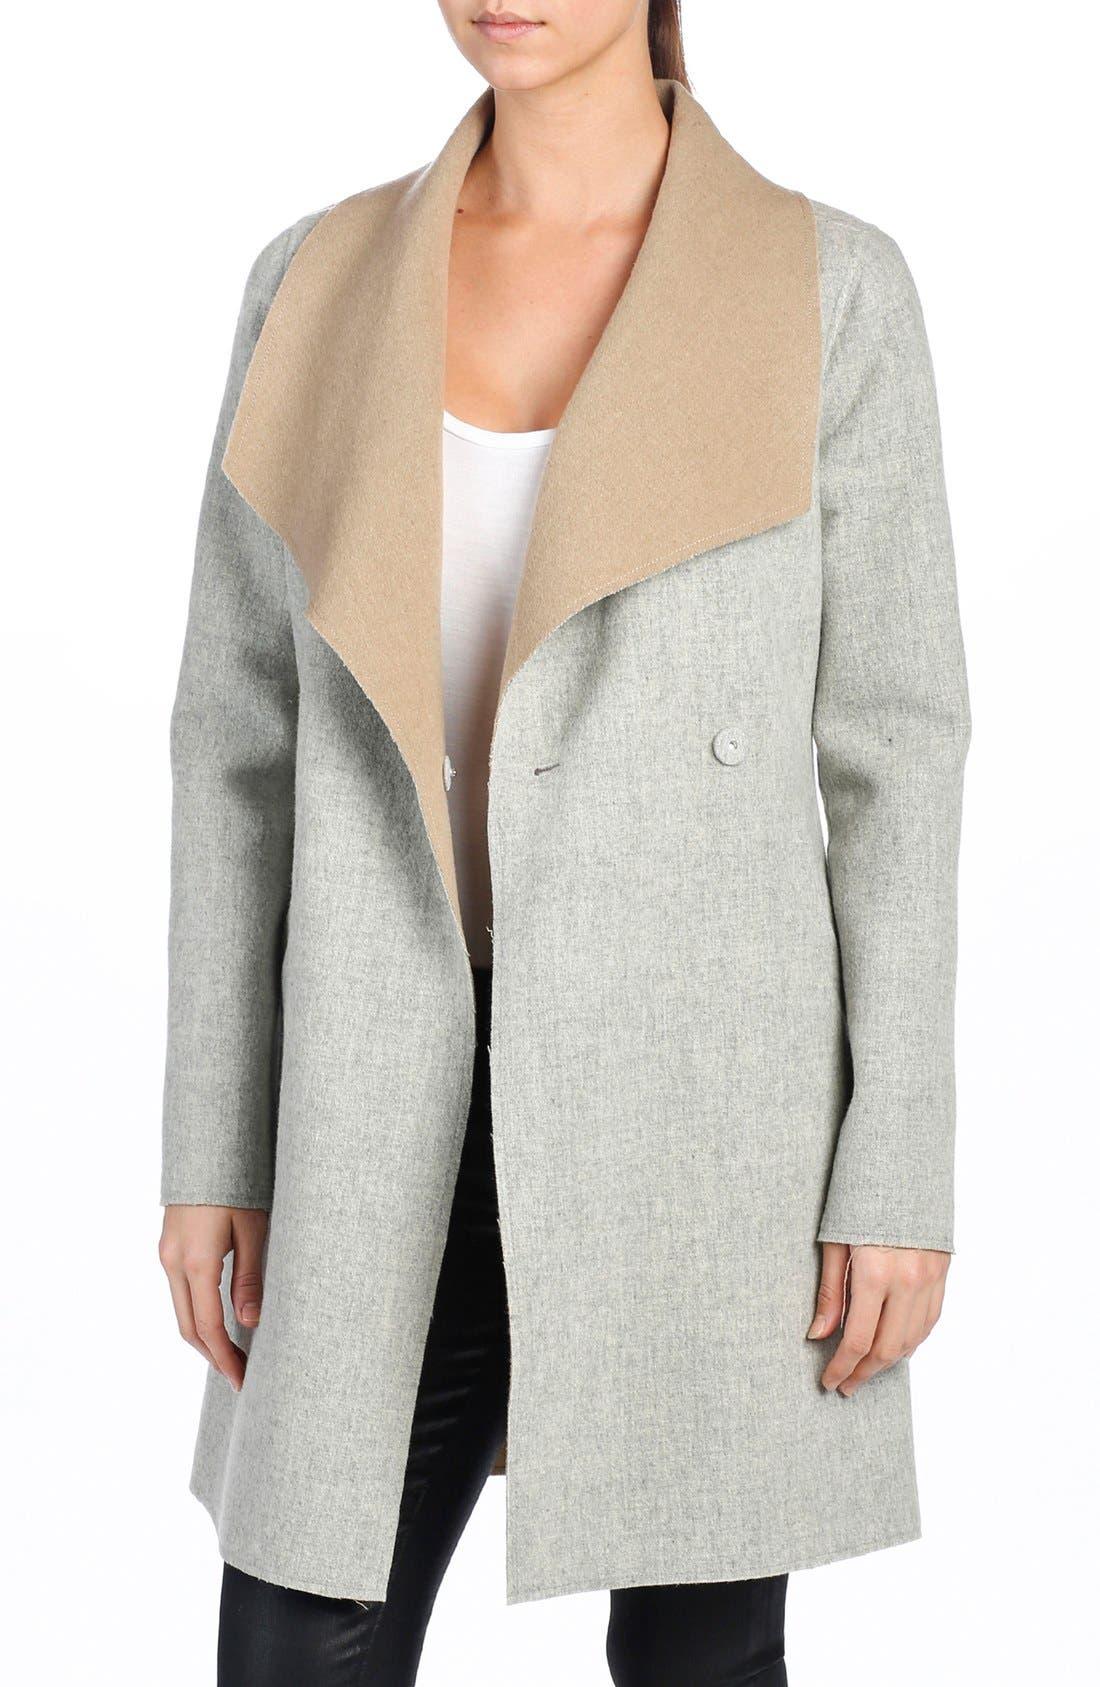 'Lily' Drape Collar Wool Blend Coat,                         Main,                         color, Heather Grey/ Caramel